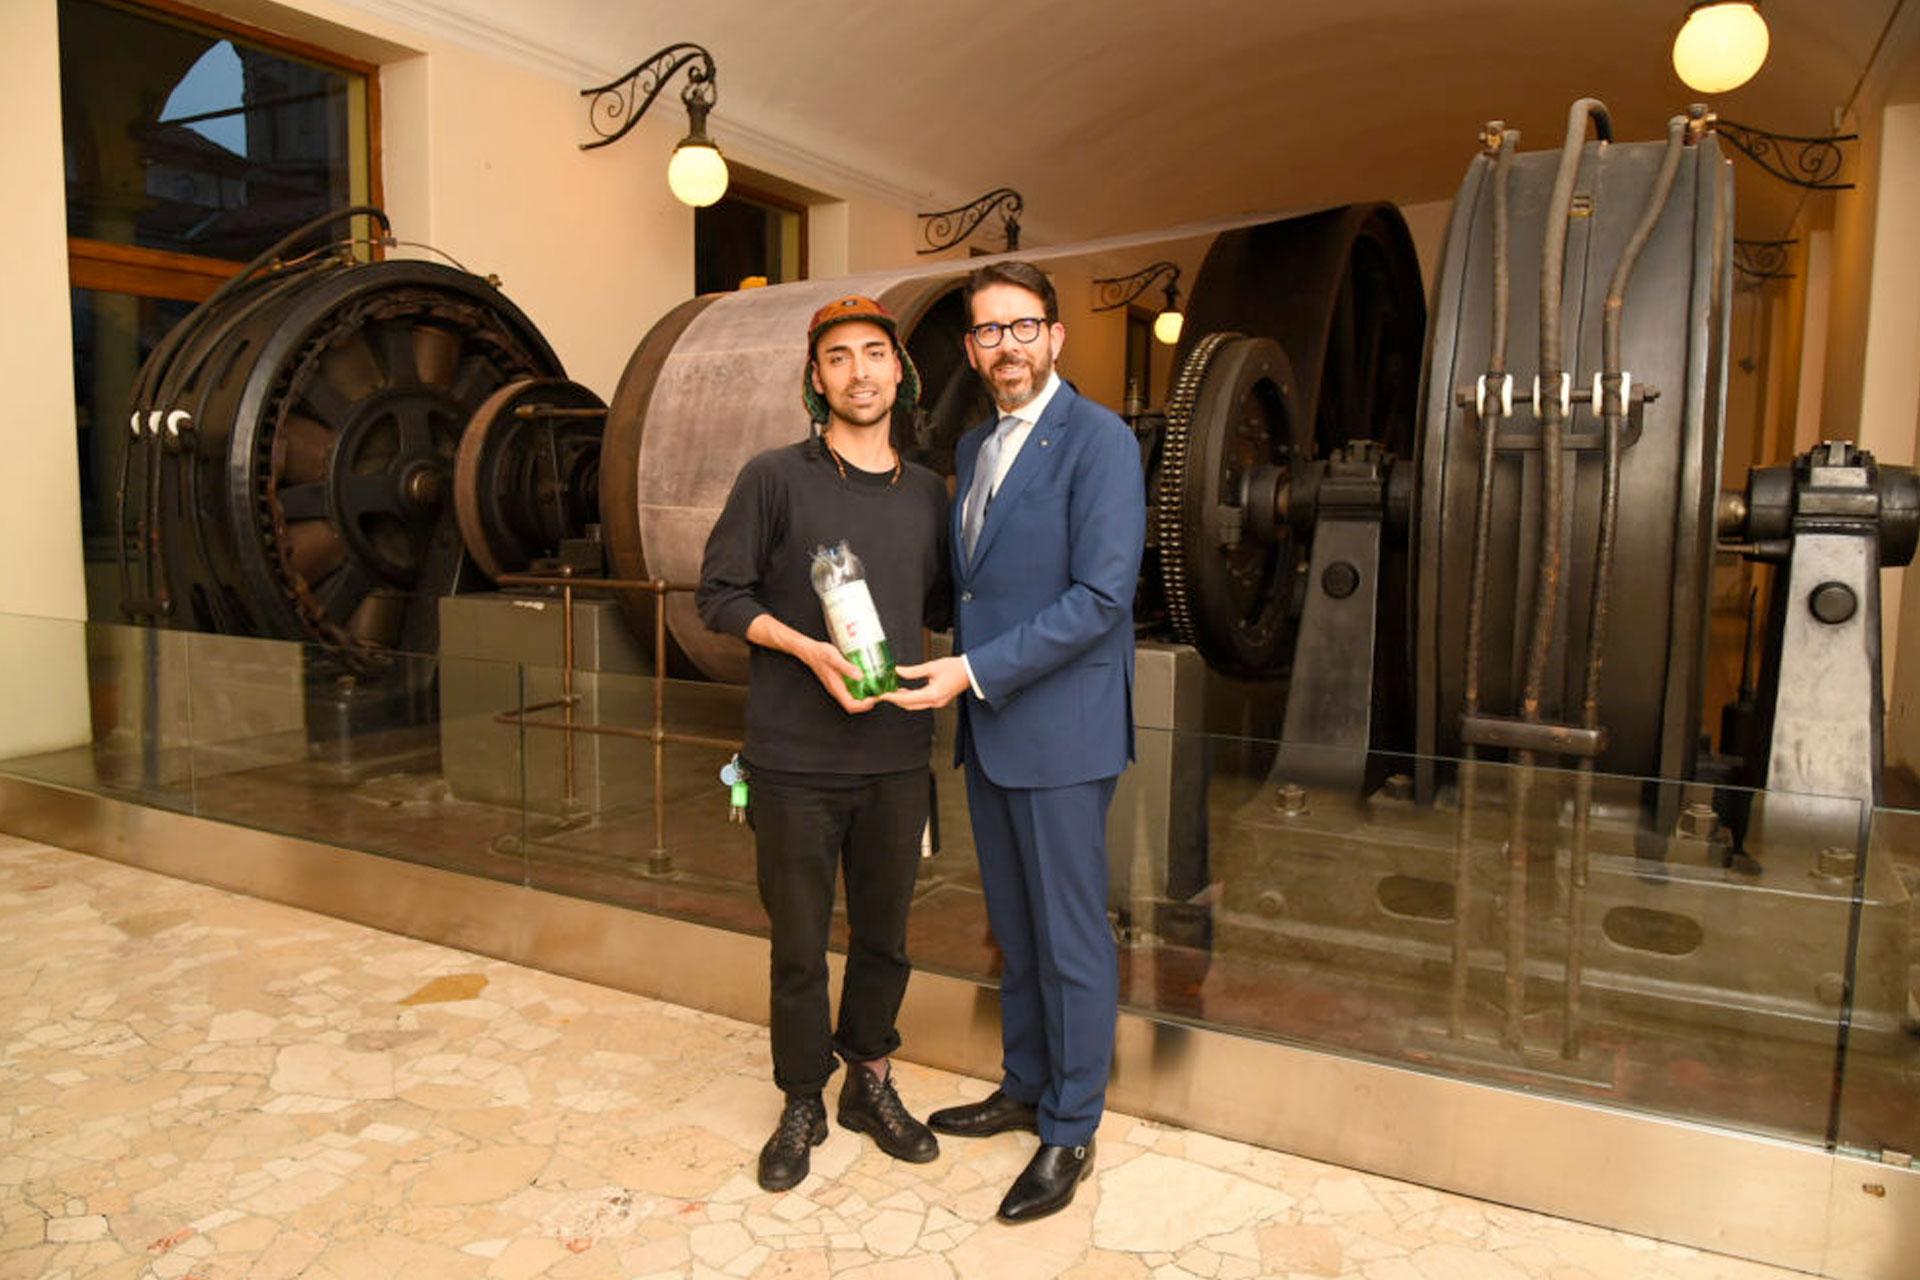 Mattia with an award